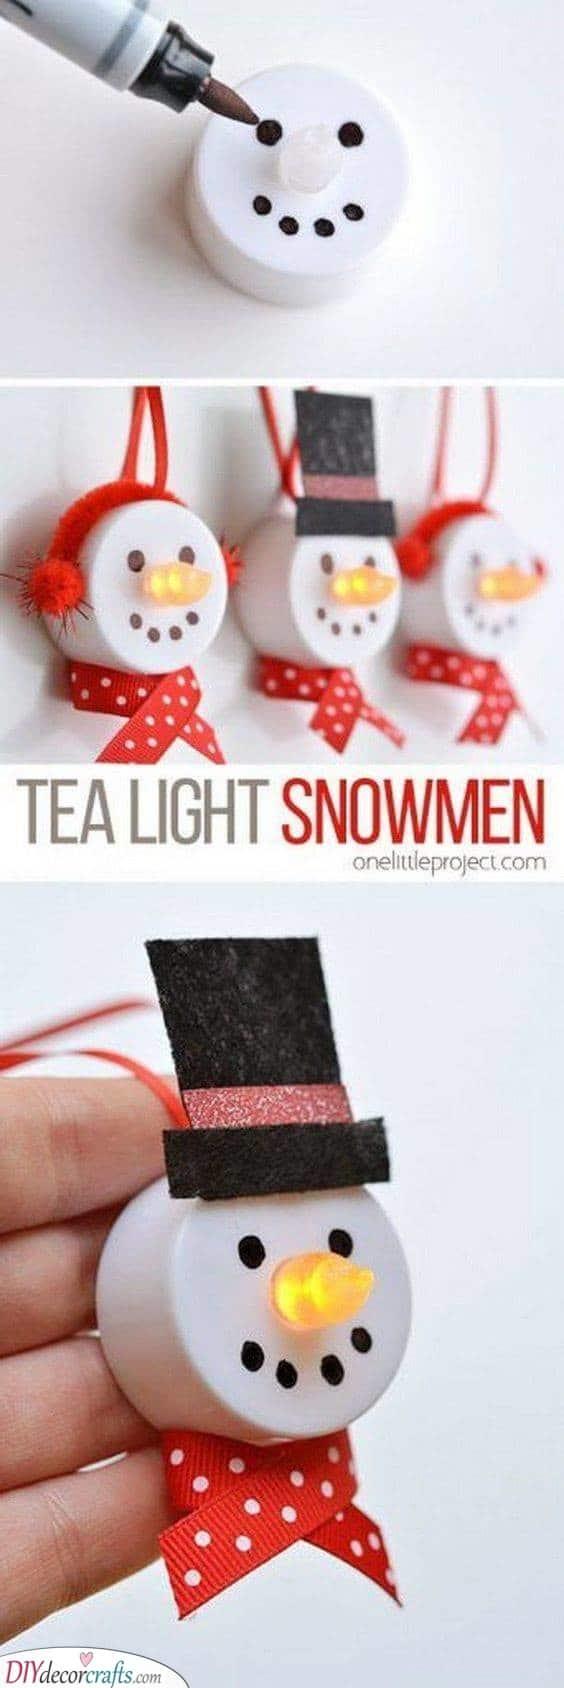 Tea Light Snowmen – Cute for Christmas